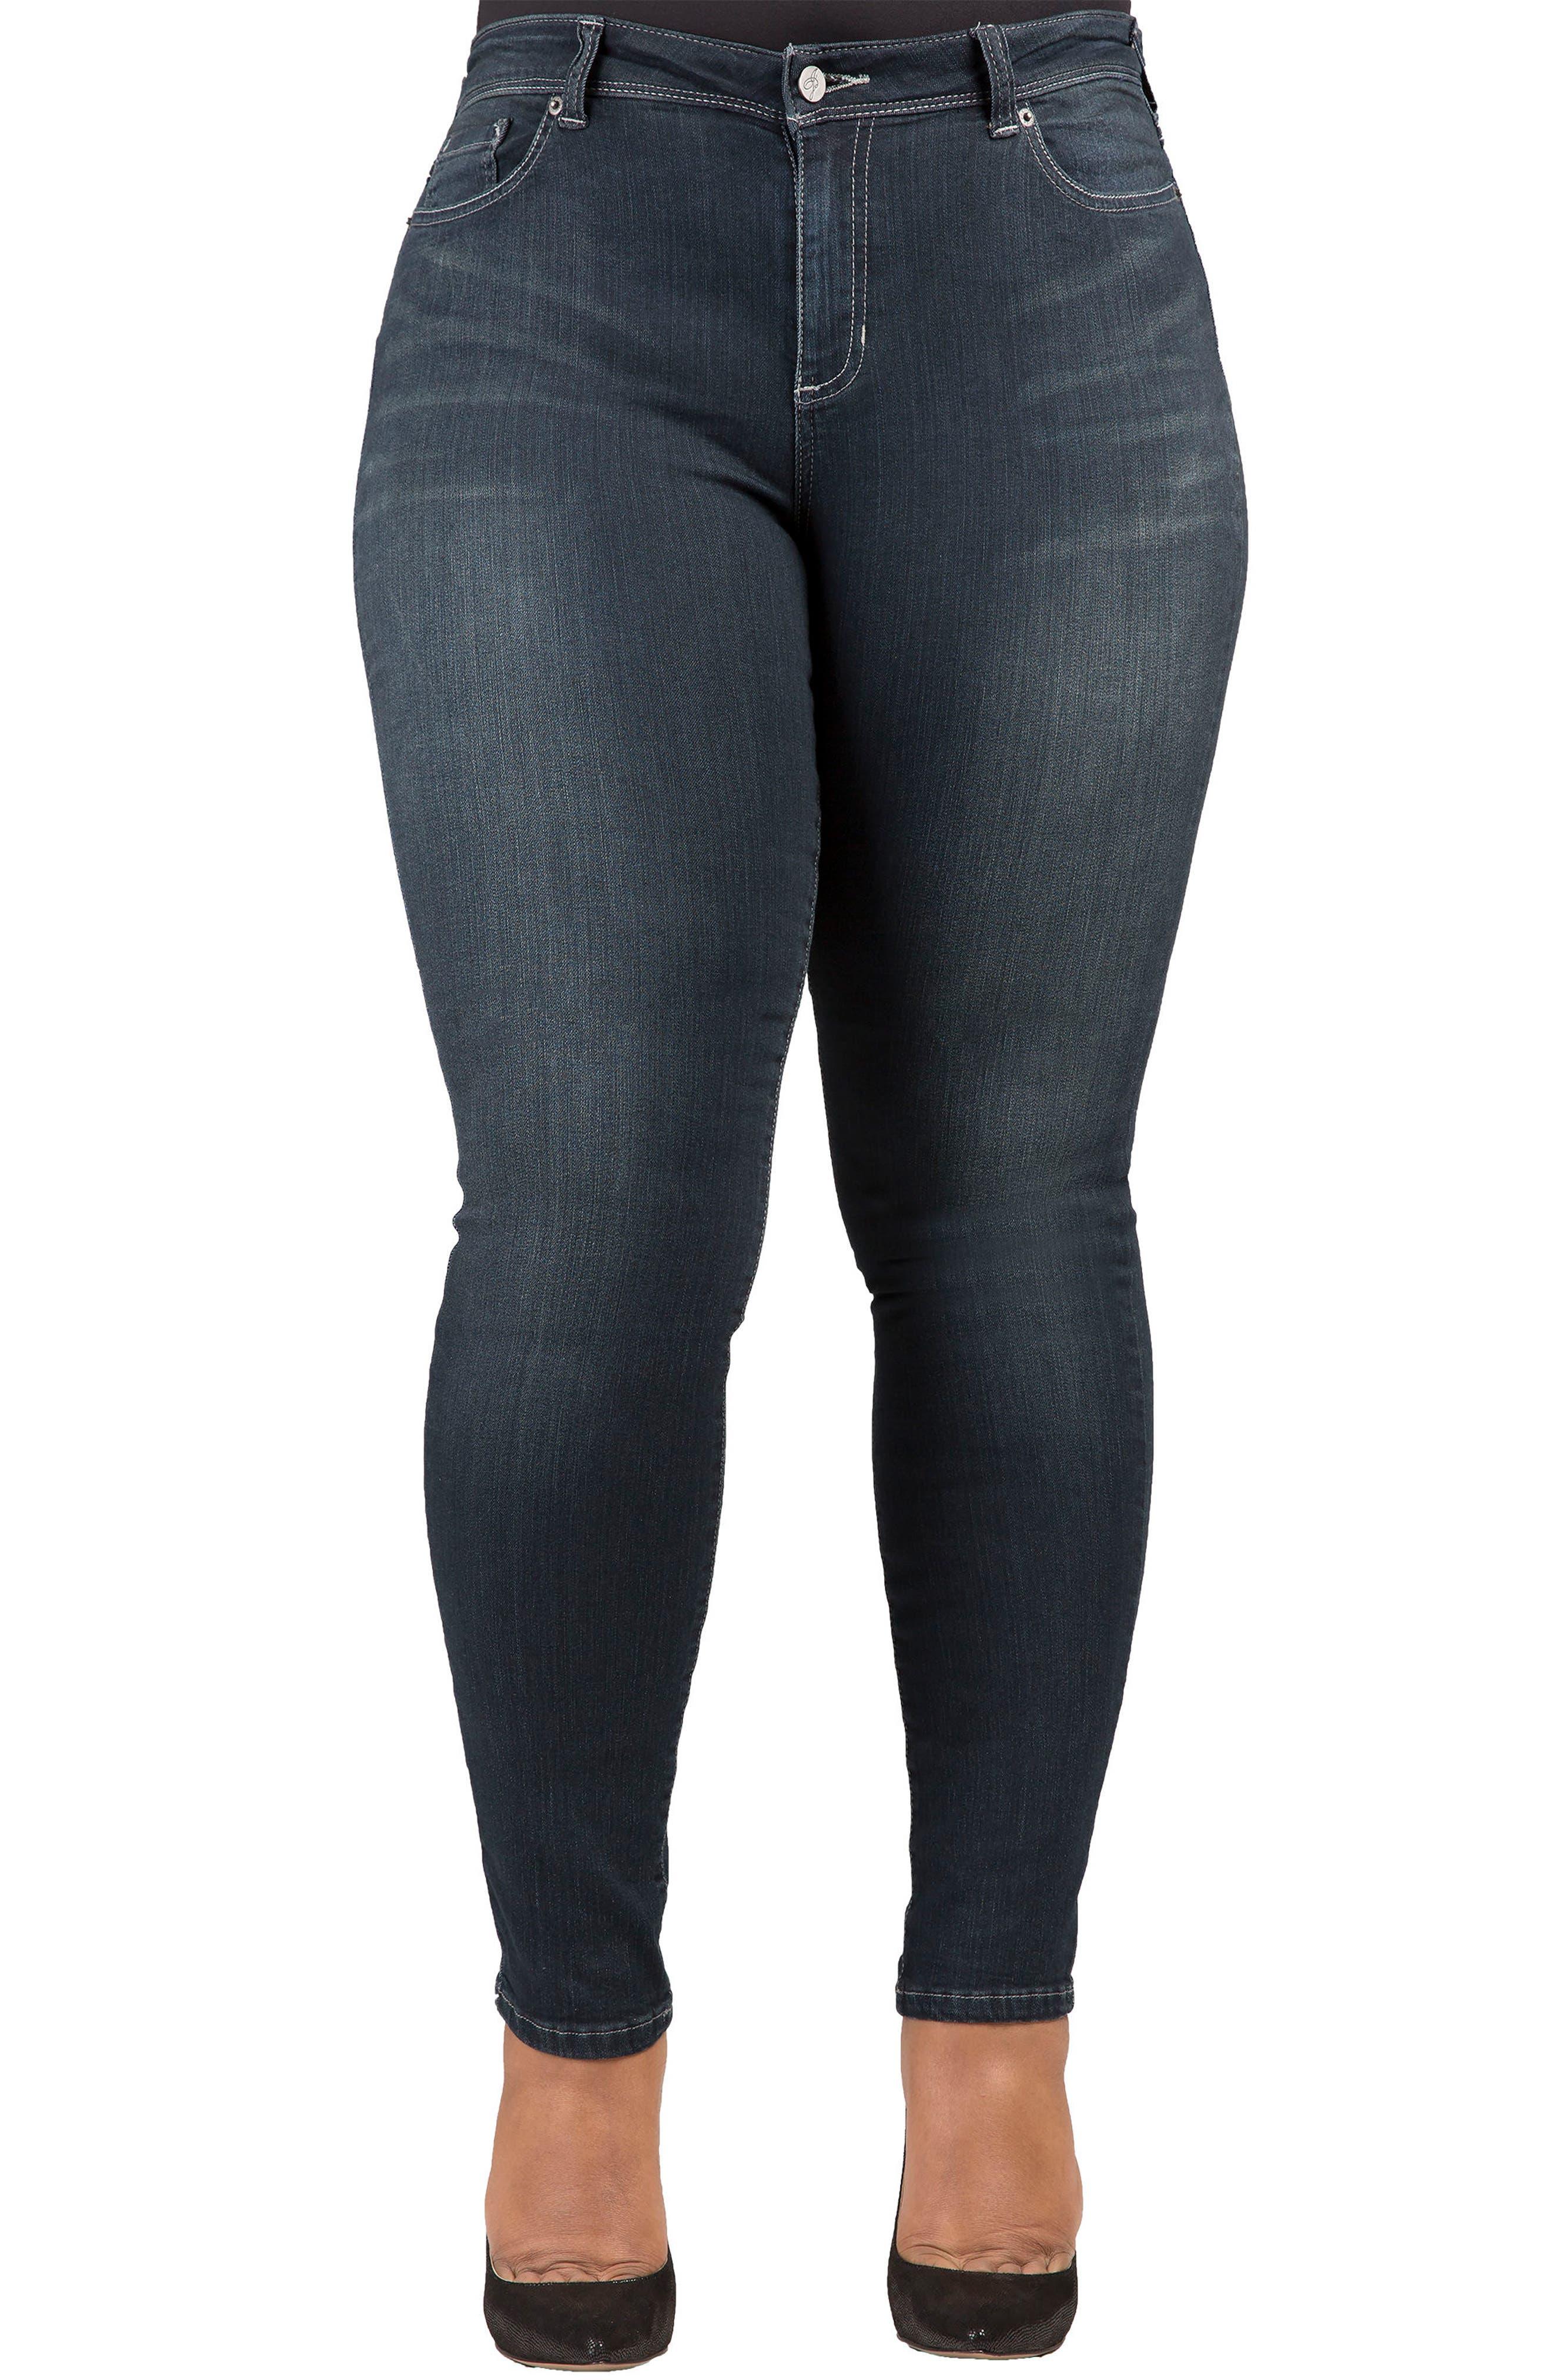 Main Image - Poetic Justice 'Maya' Stretch Skinny Jeans (Dark Blue) (Plus Size)